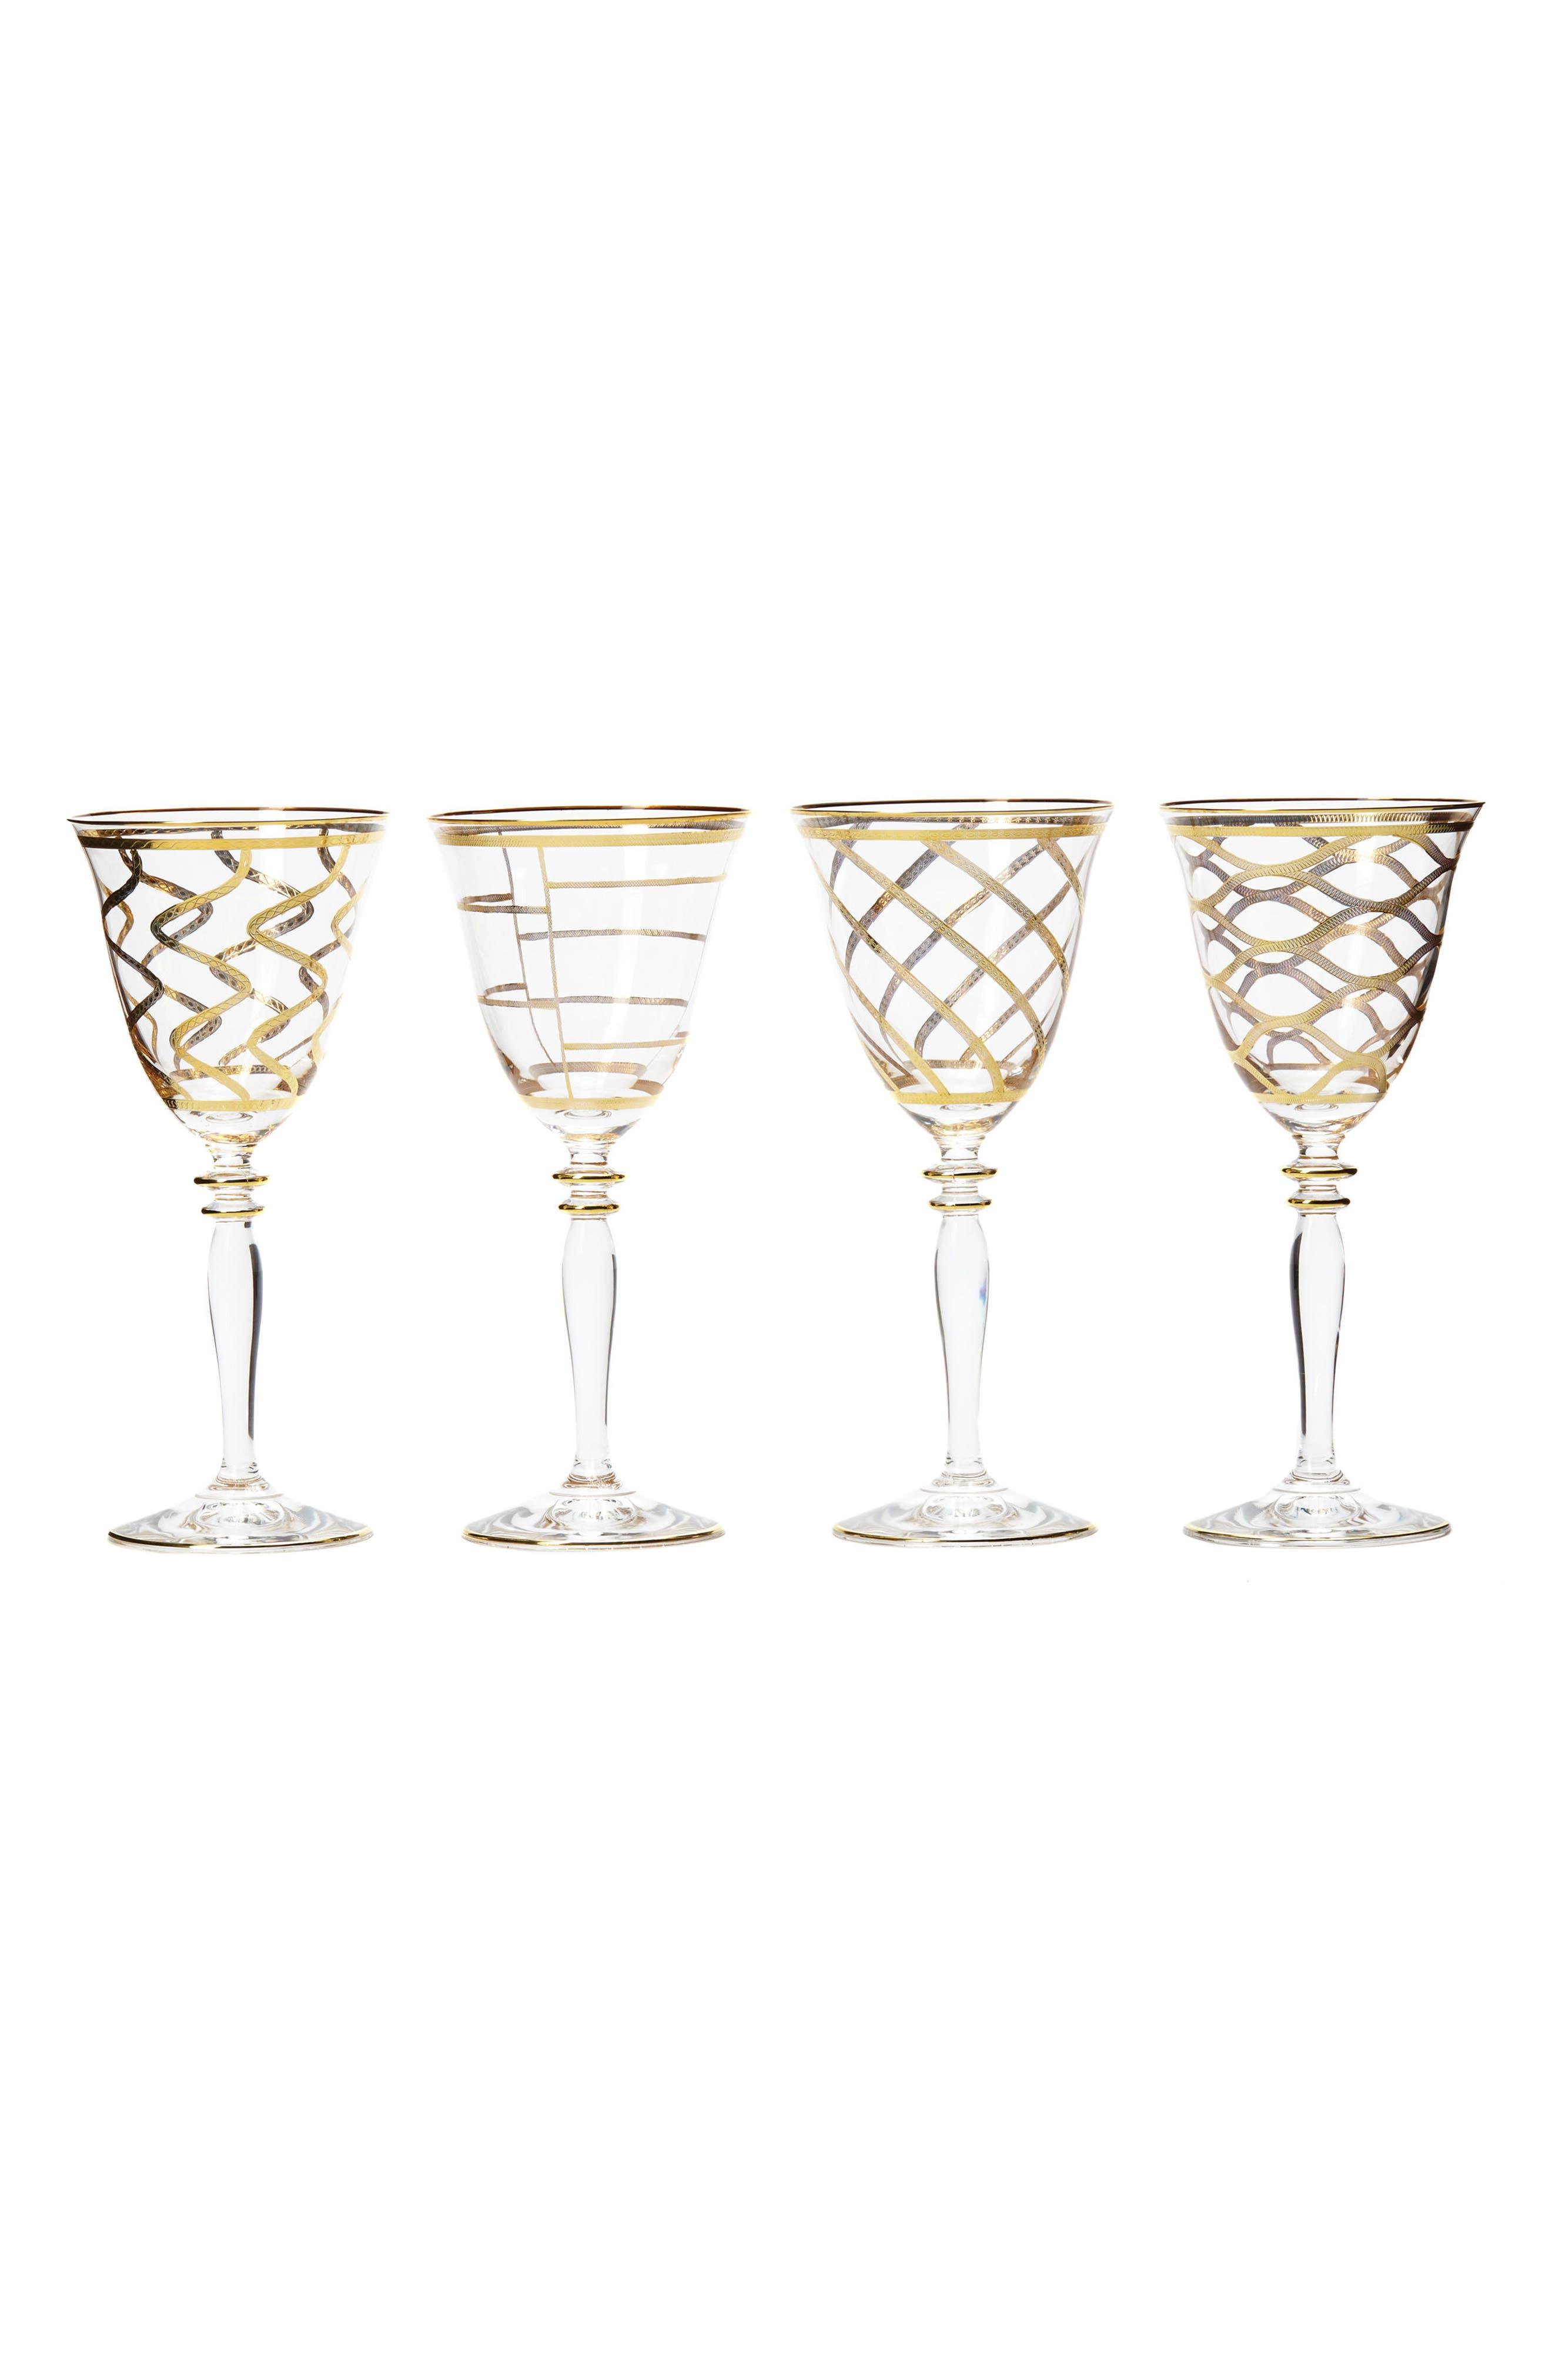 Elegante Set of 4 Wine Glasses,                             Main thumbnail 1, color,                             Gold